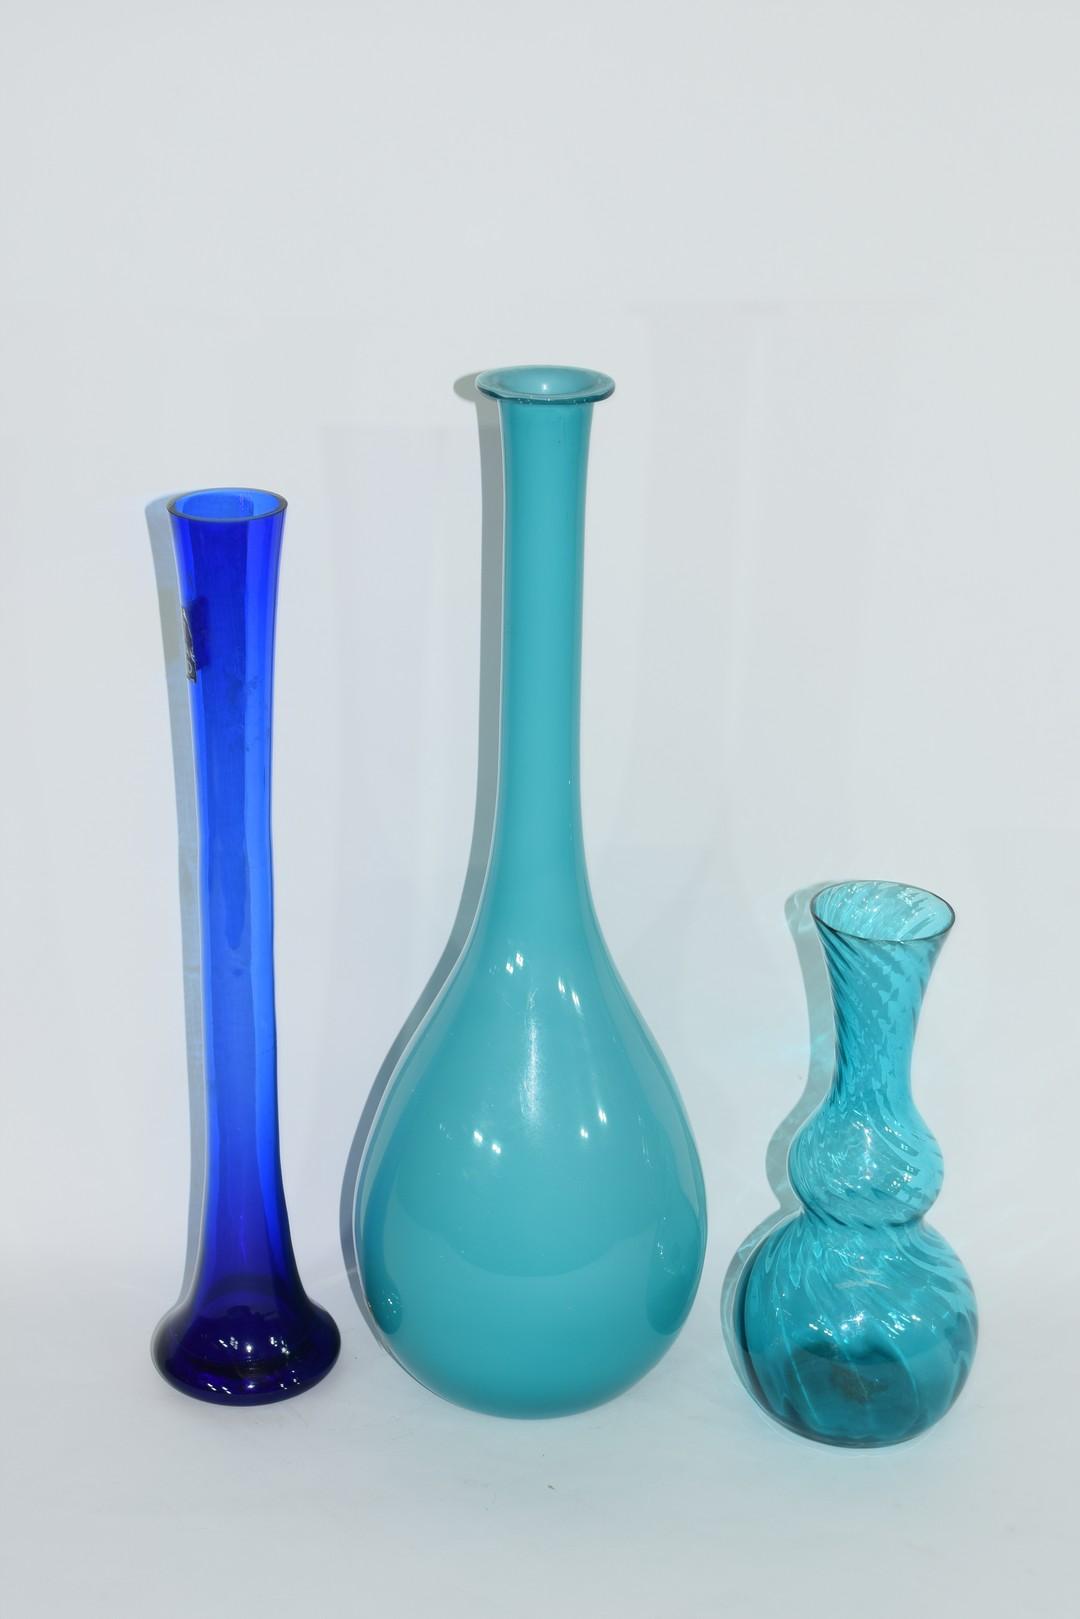 Three Art glass vases - Image 2 of 2